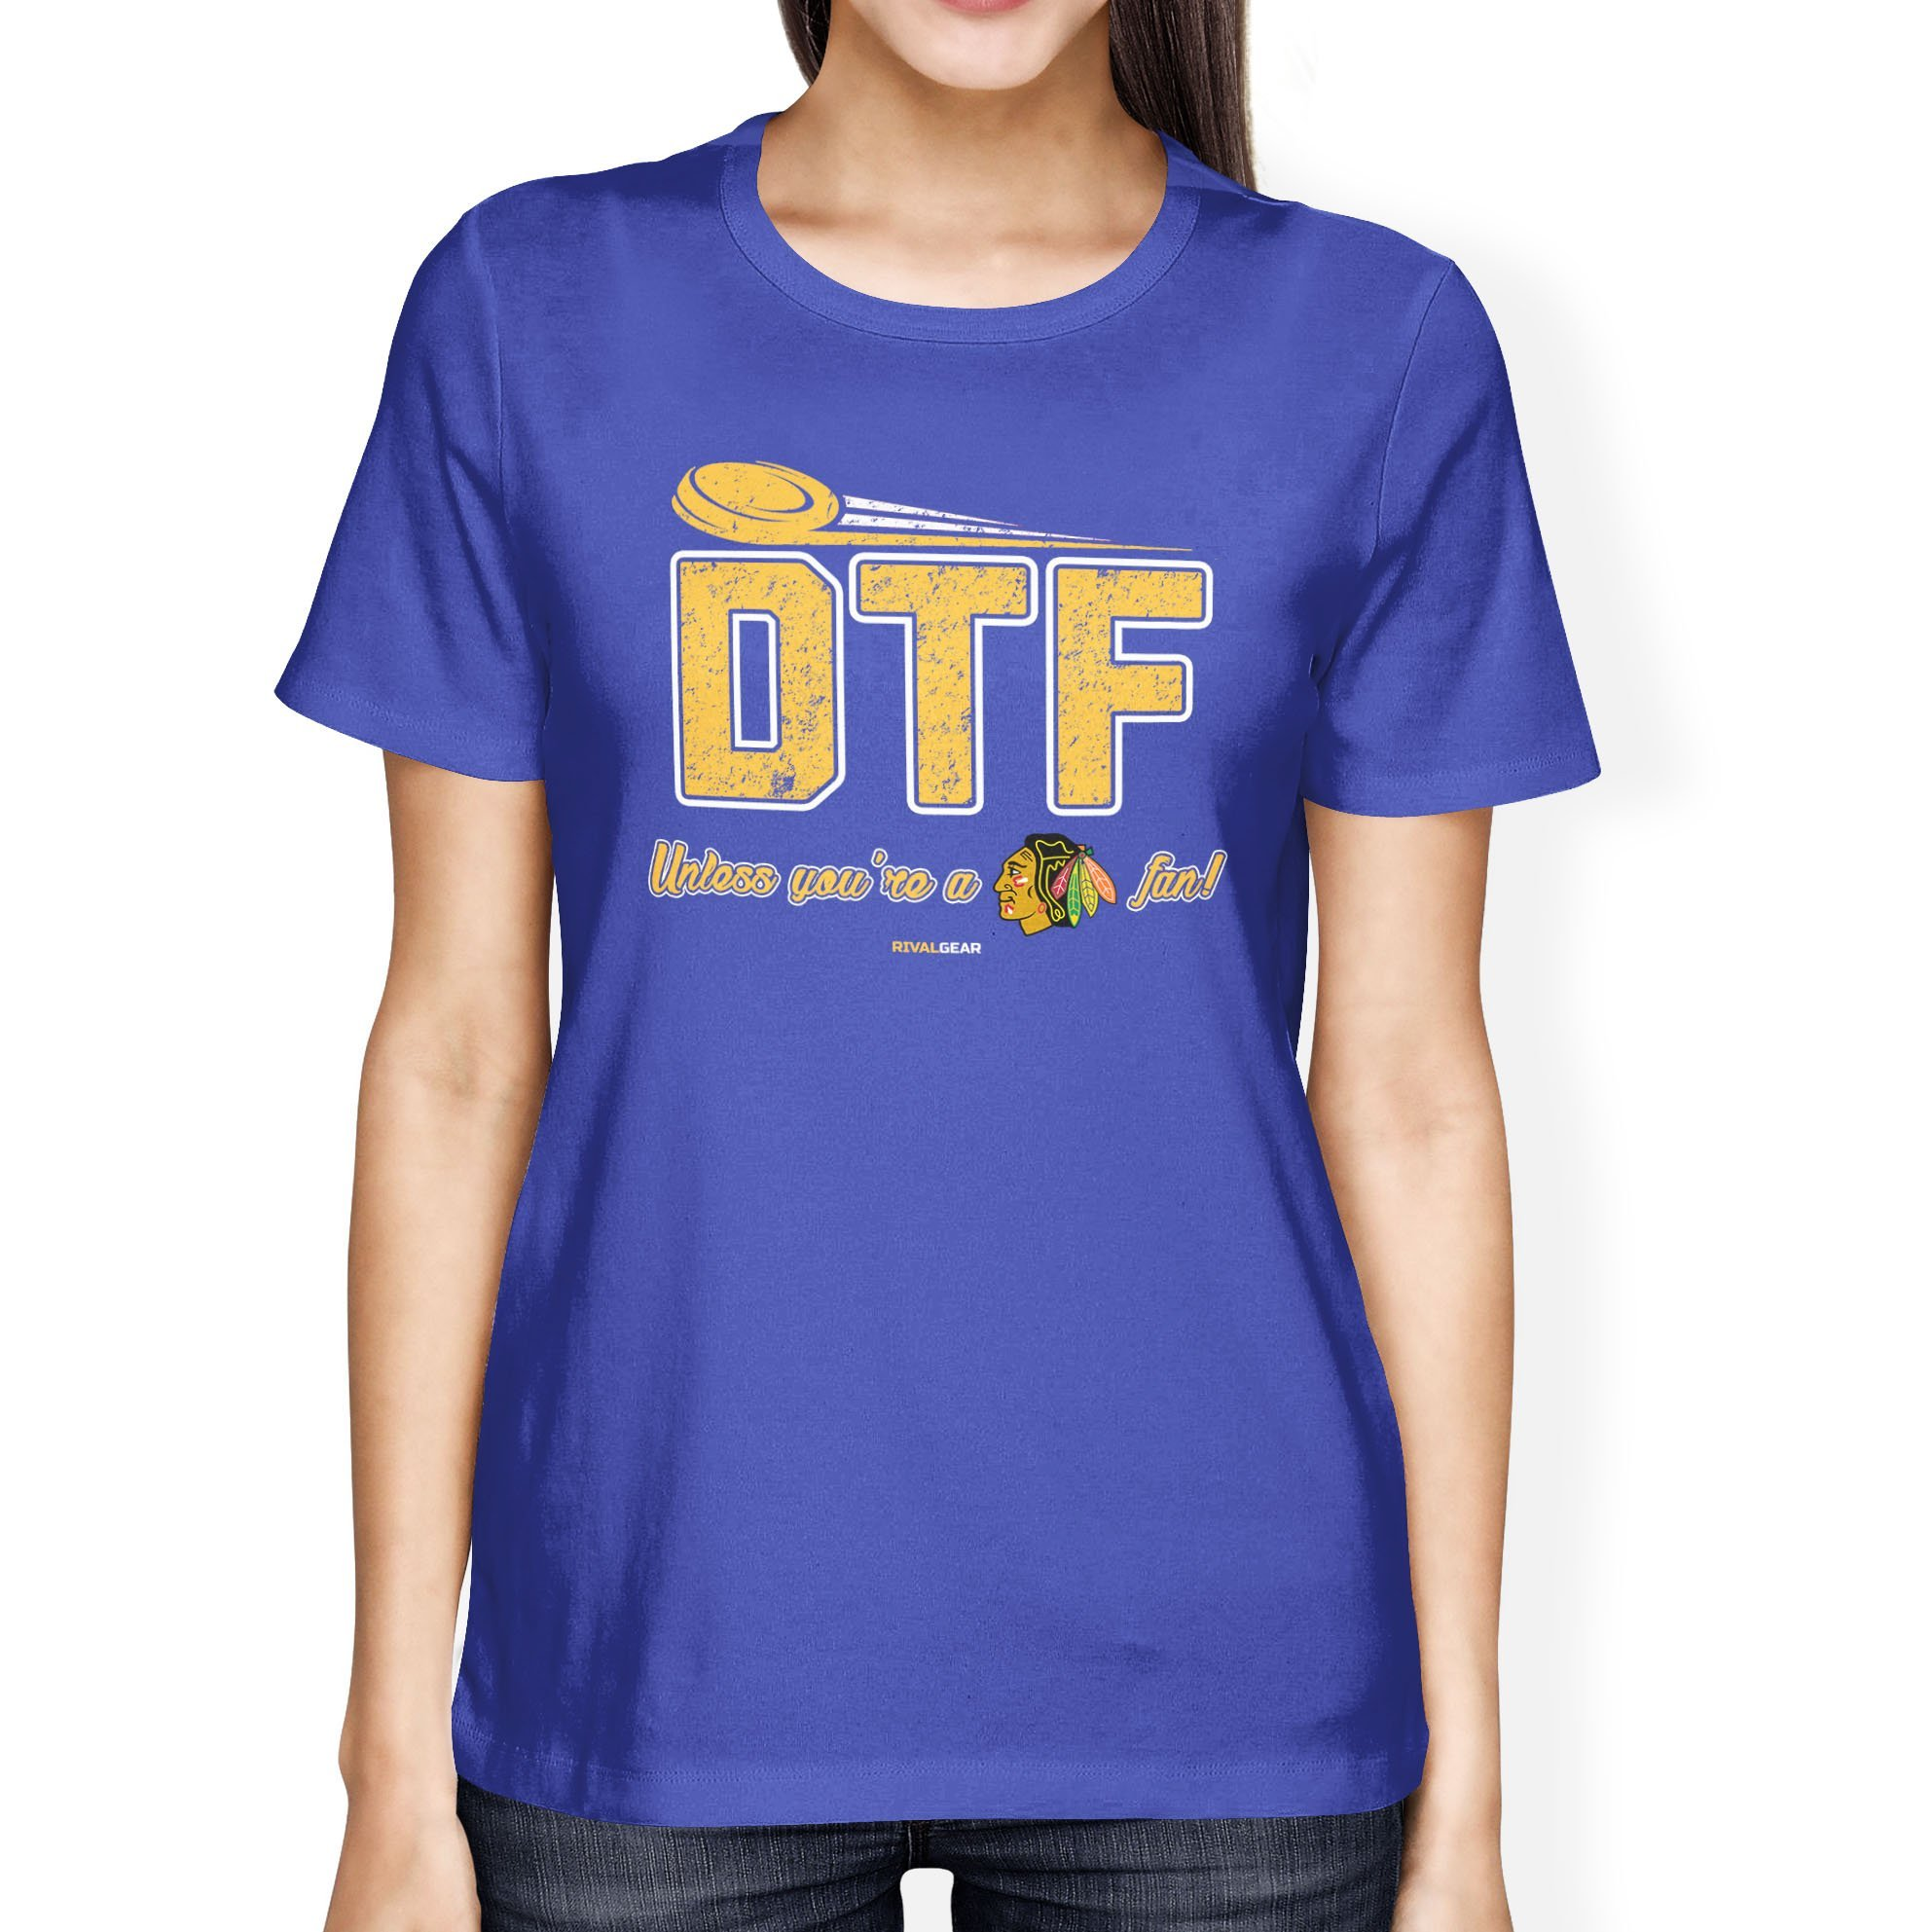 St Louis Hockey Tshirt Dtf By